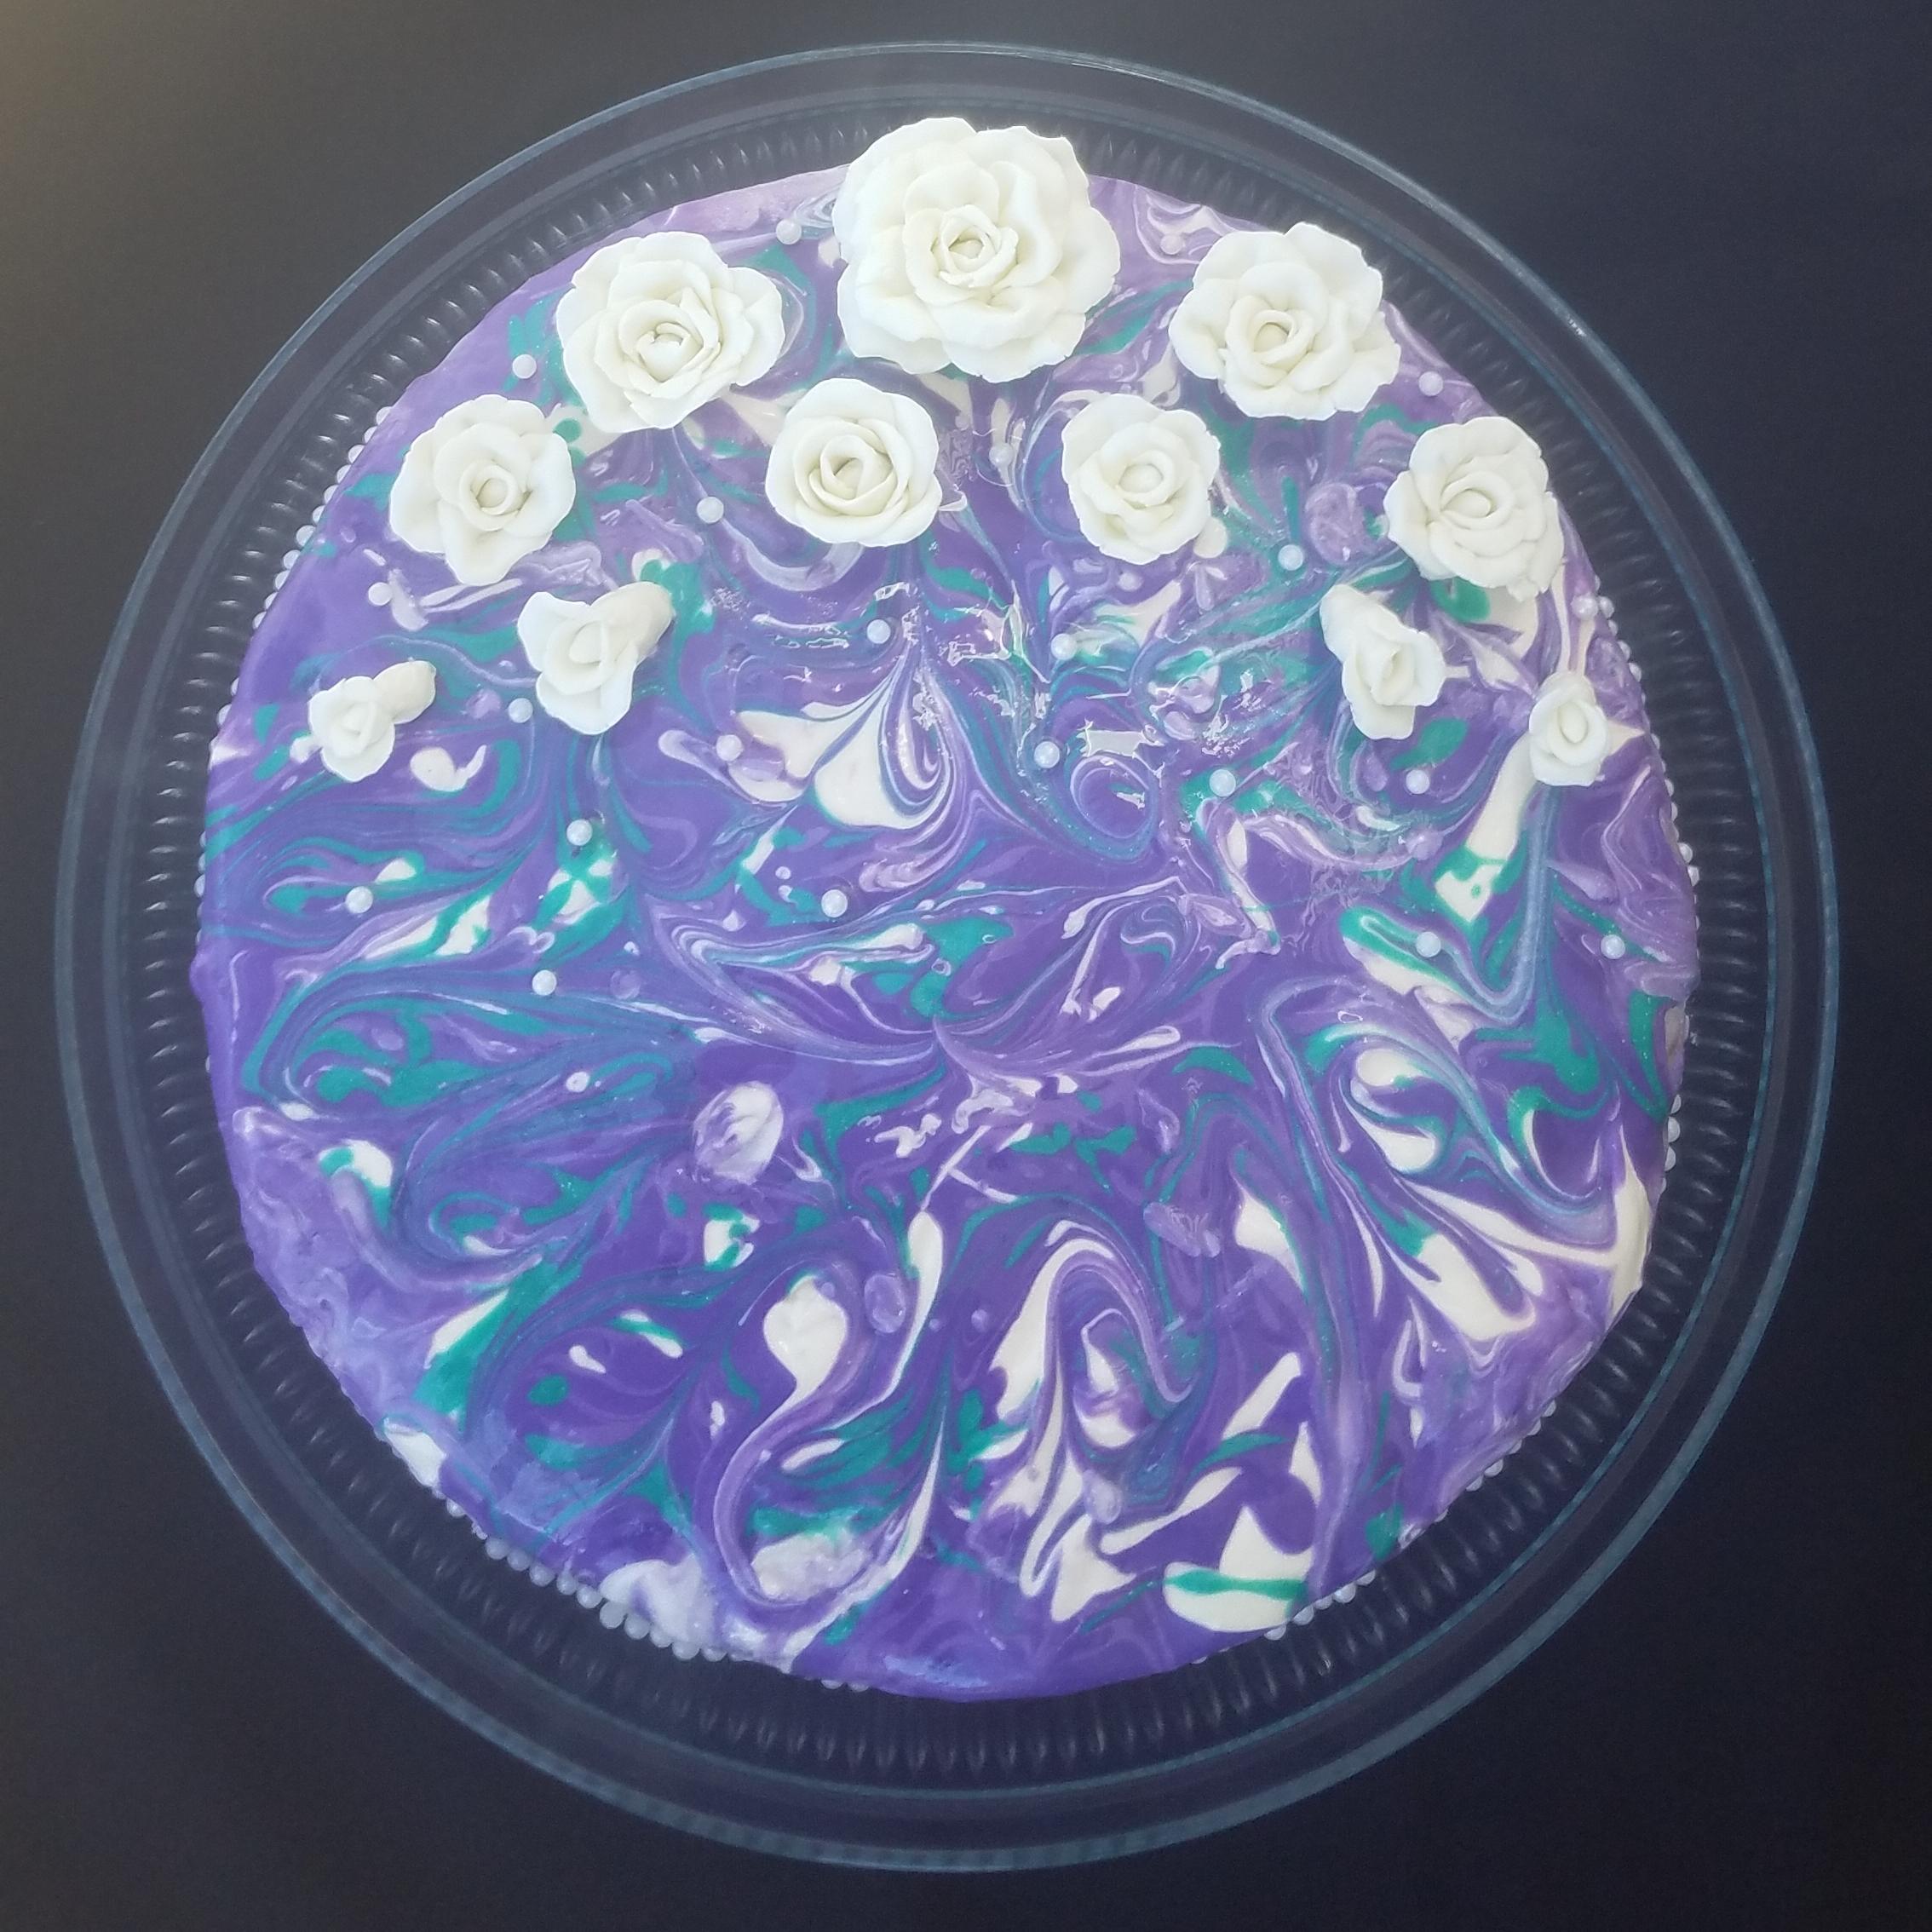 caramel lavender cheesecake